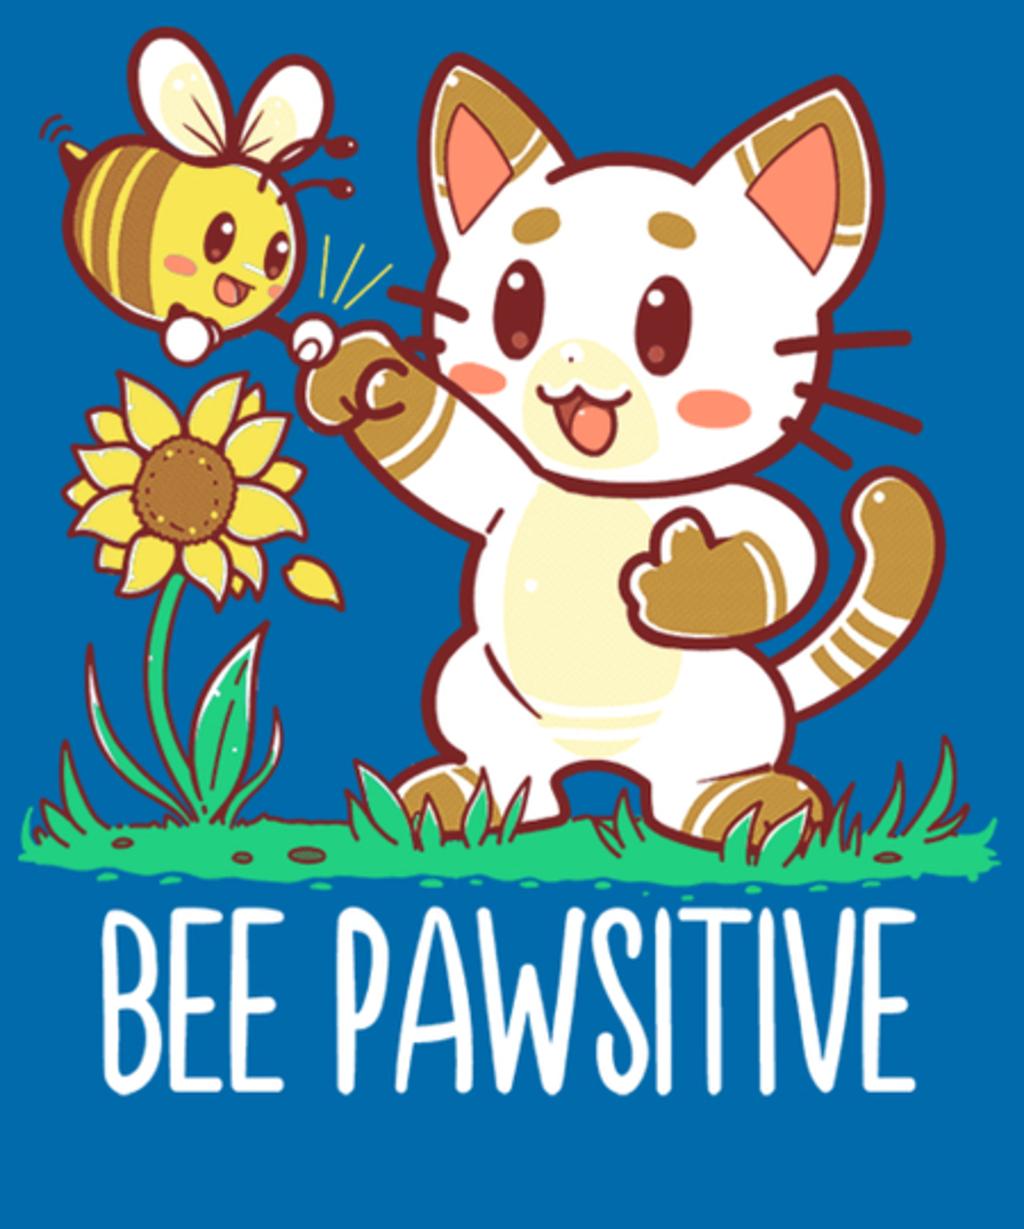 Qwertee: Bee Pawsitive